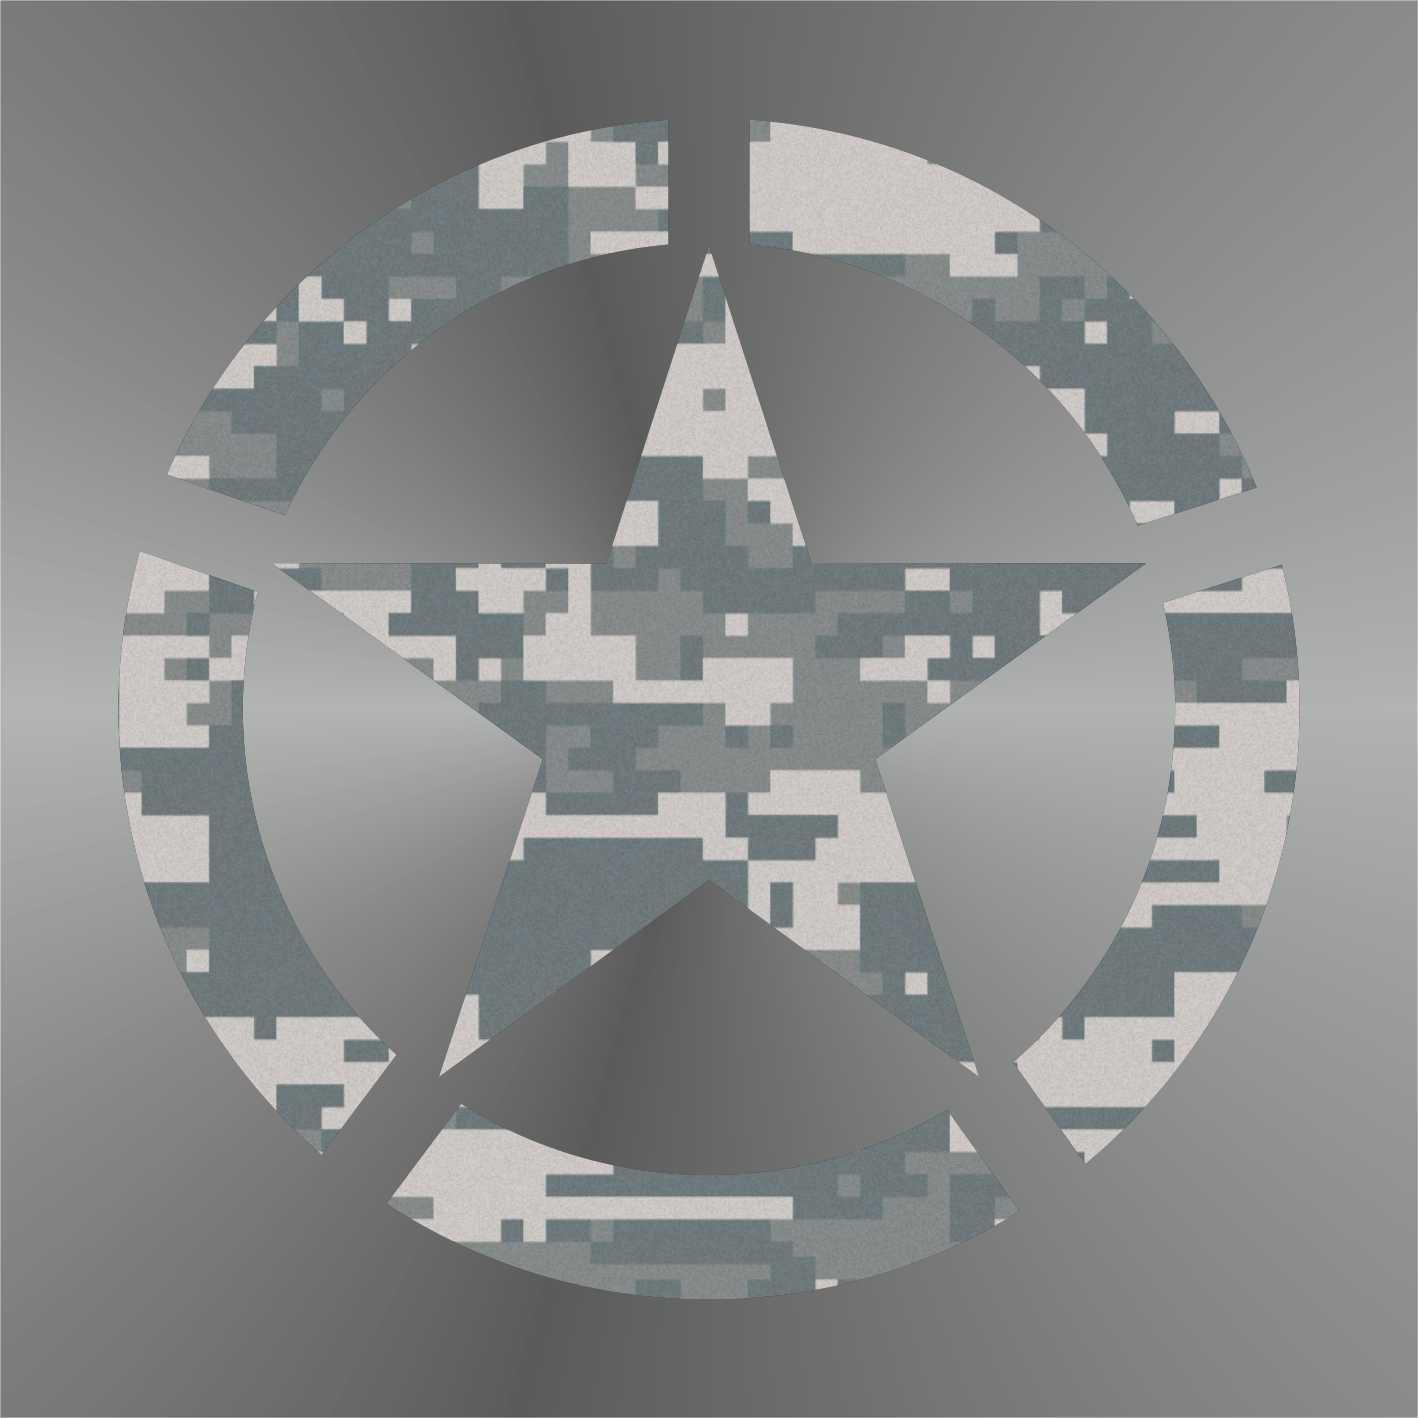 Sticker Stella Militare Military Star Milit/är Sterne estrella de los militares /étoiles militaire Decal Cars Motorcycles Helmet Wall Camper Bike Adesivo Adhesive Autocollant Pegatina Aufkleber cm 10